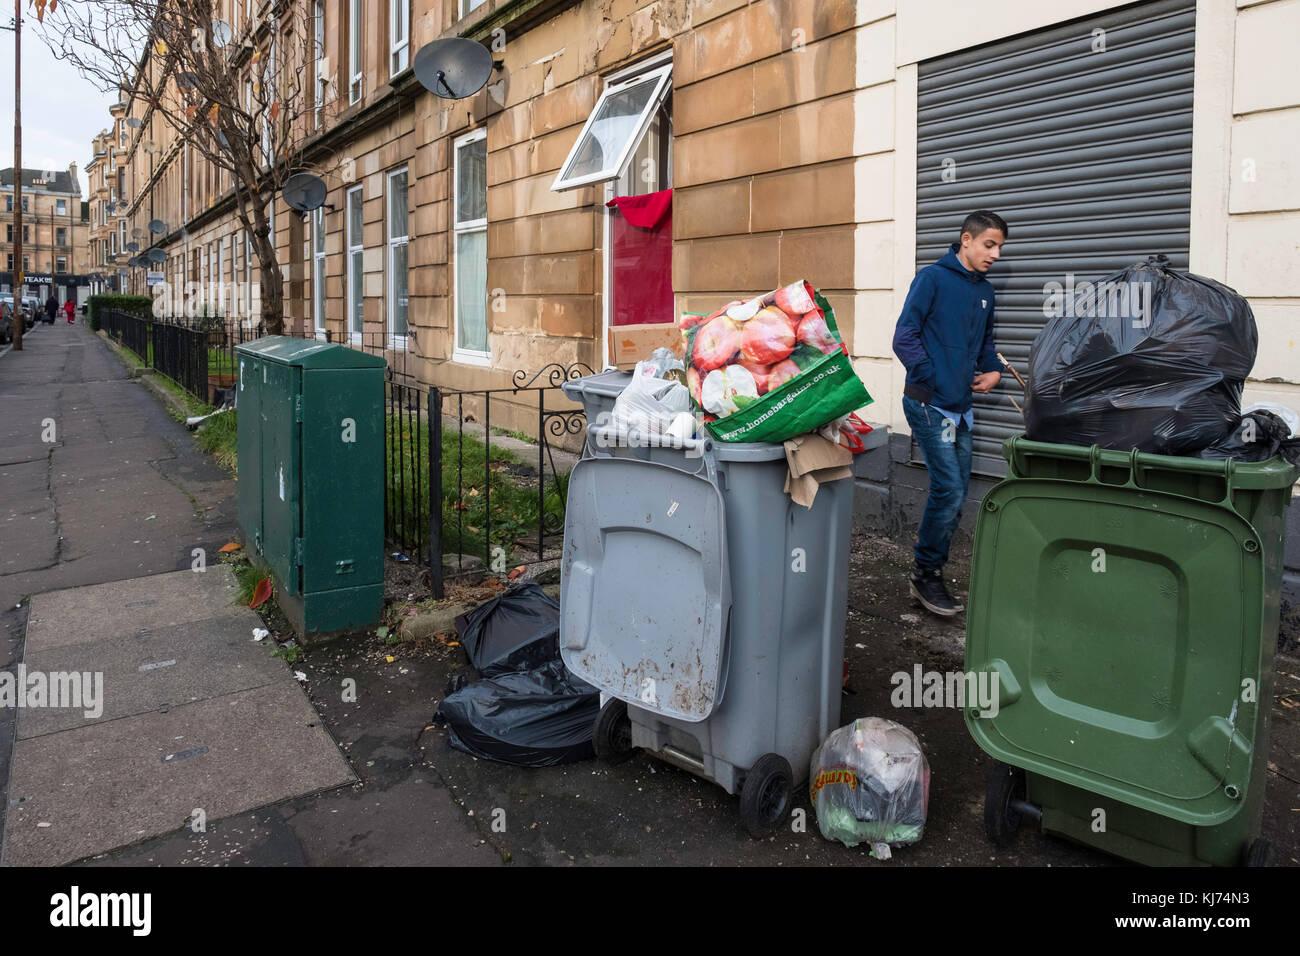 rubbish bins and neighbourhood stock photos & rubbish bins and